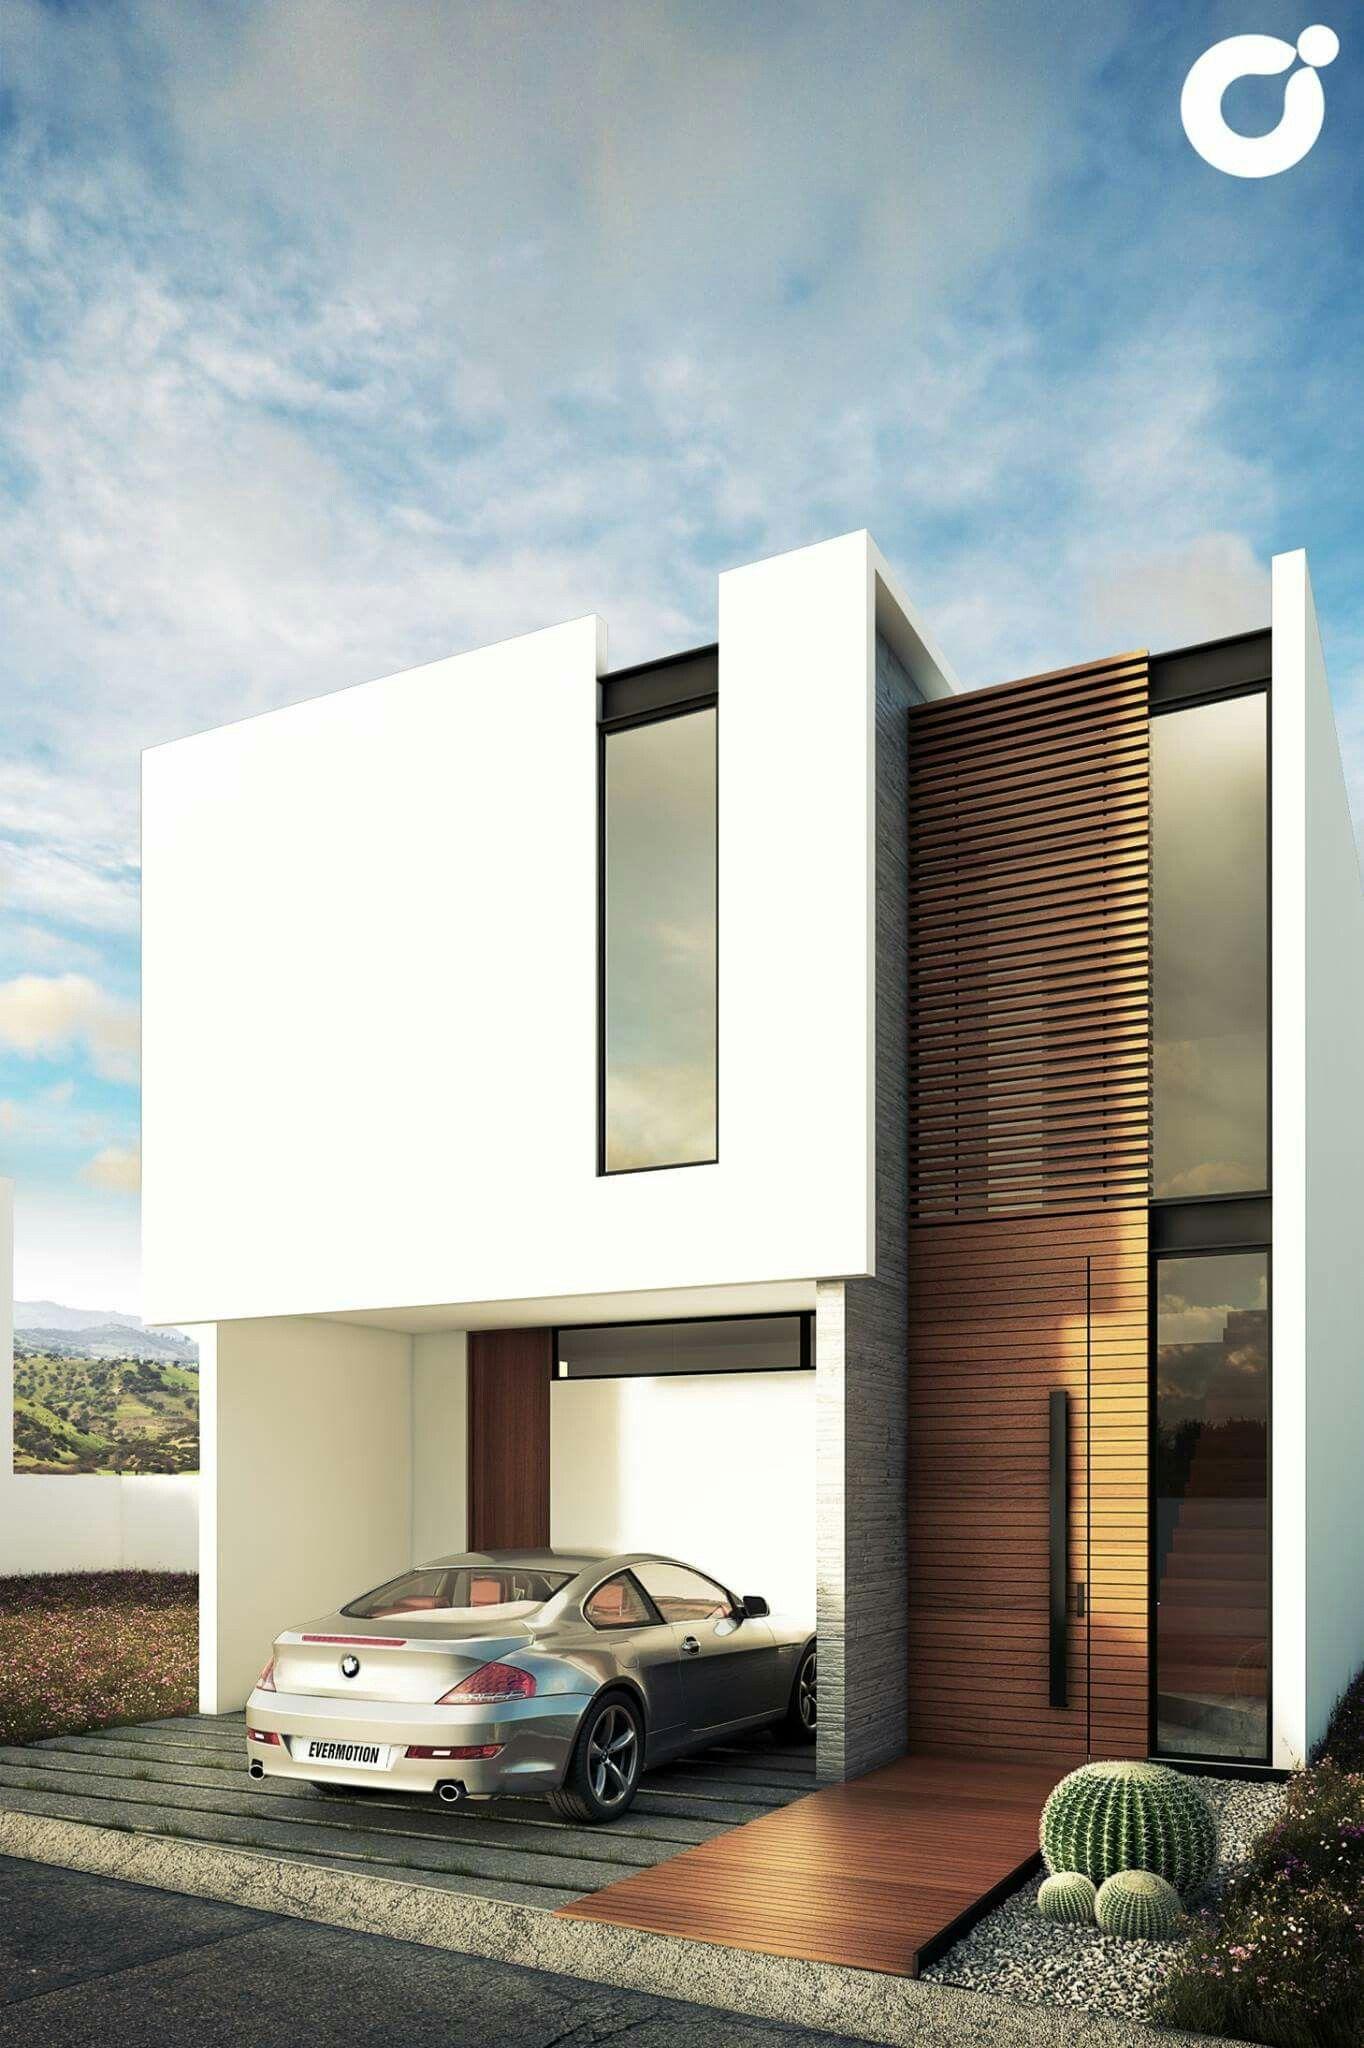 Pin de bady la en proyectos a intentar arquitectura casas modernas y arquitectura casas - Arquitectura casas modernas ...